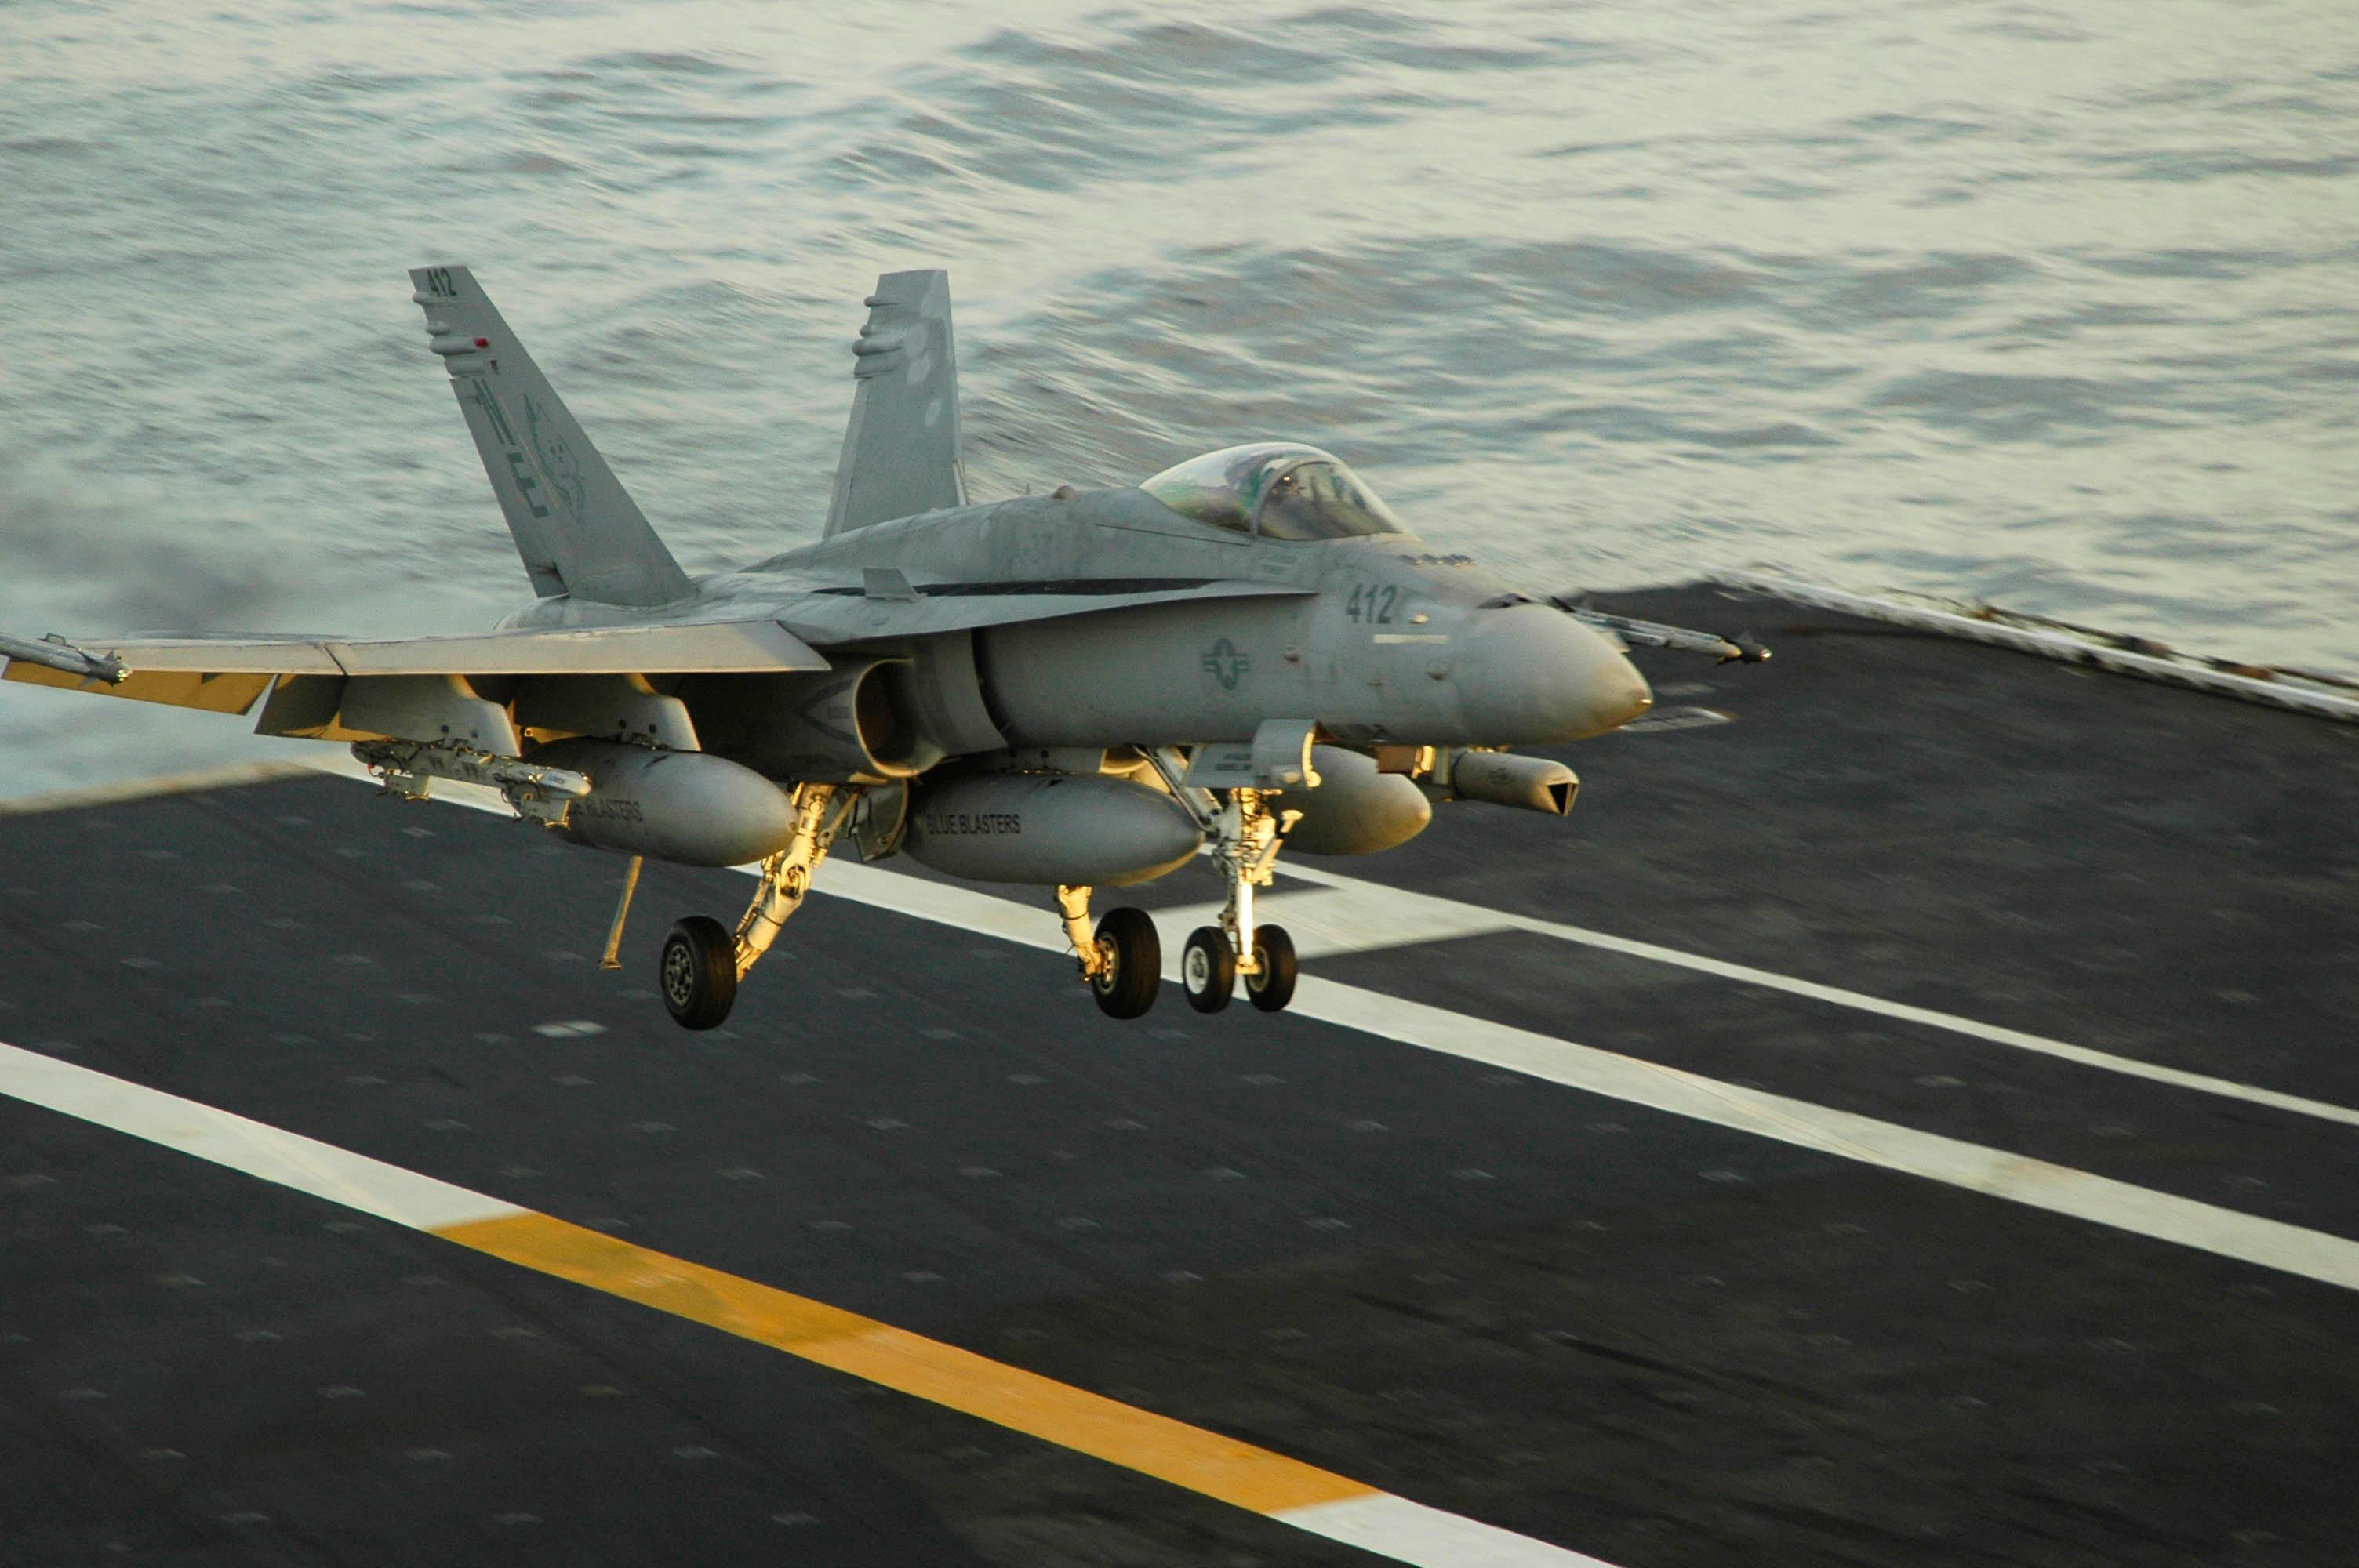 Carrier Landing by jamezevanz